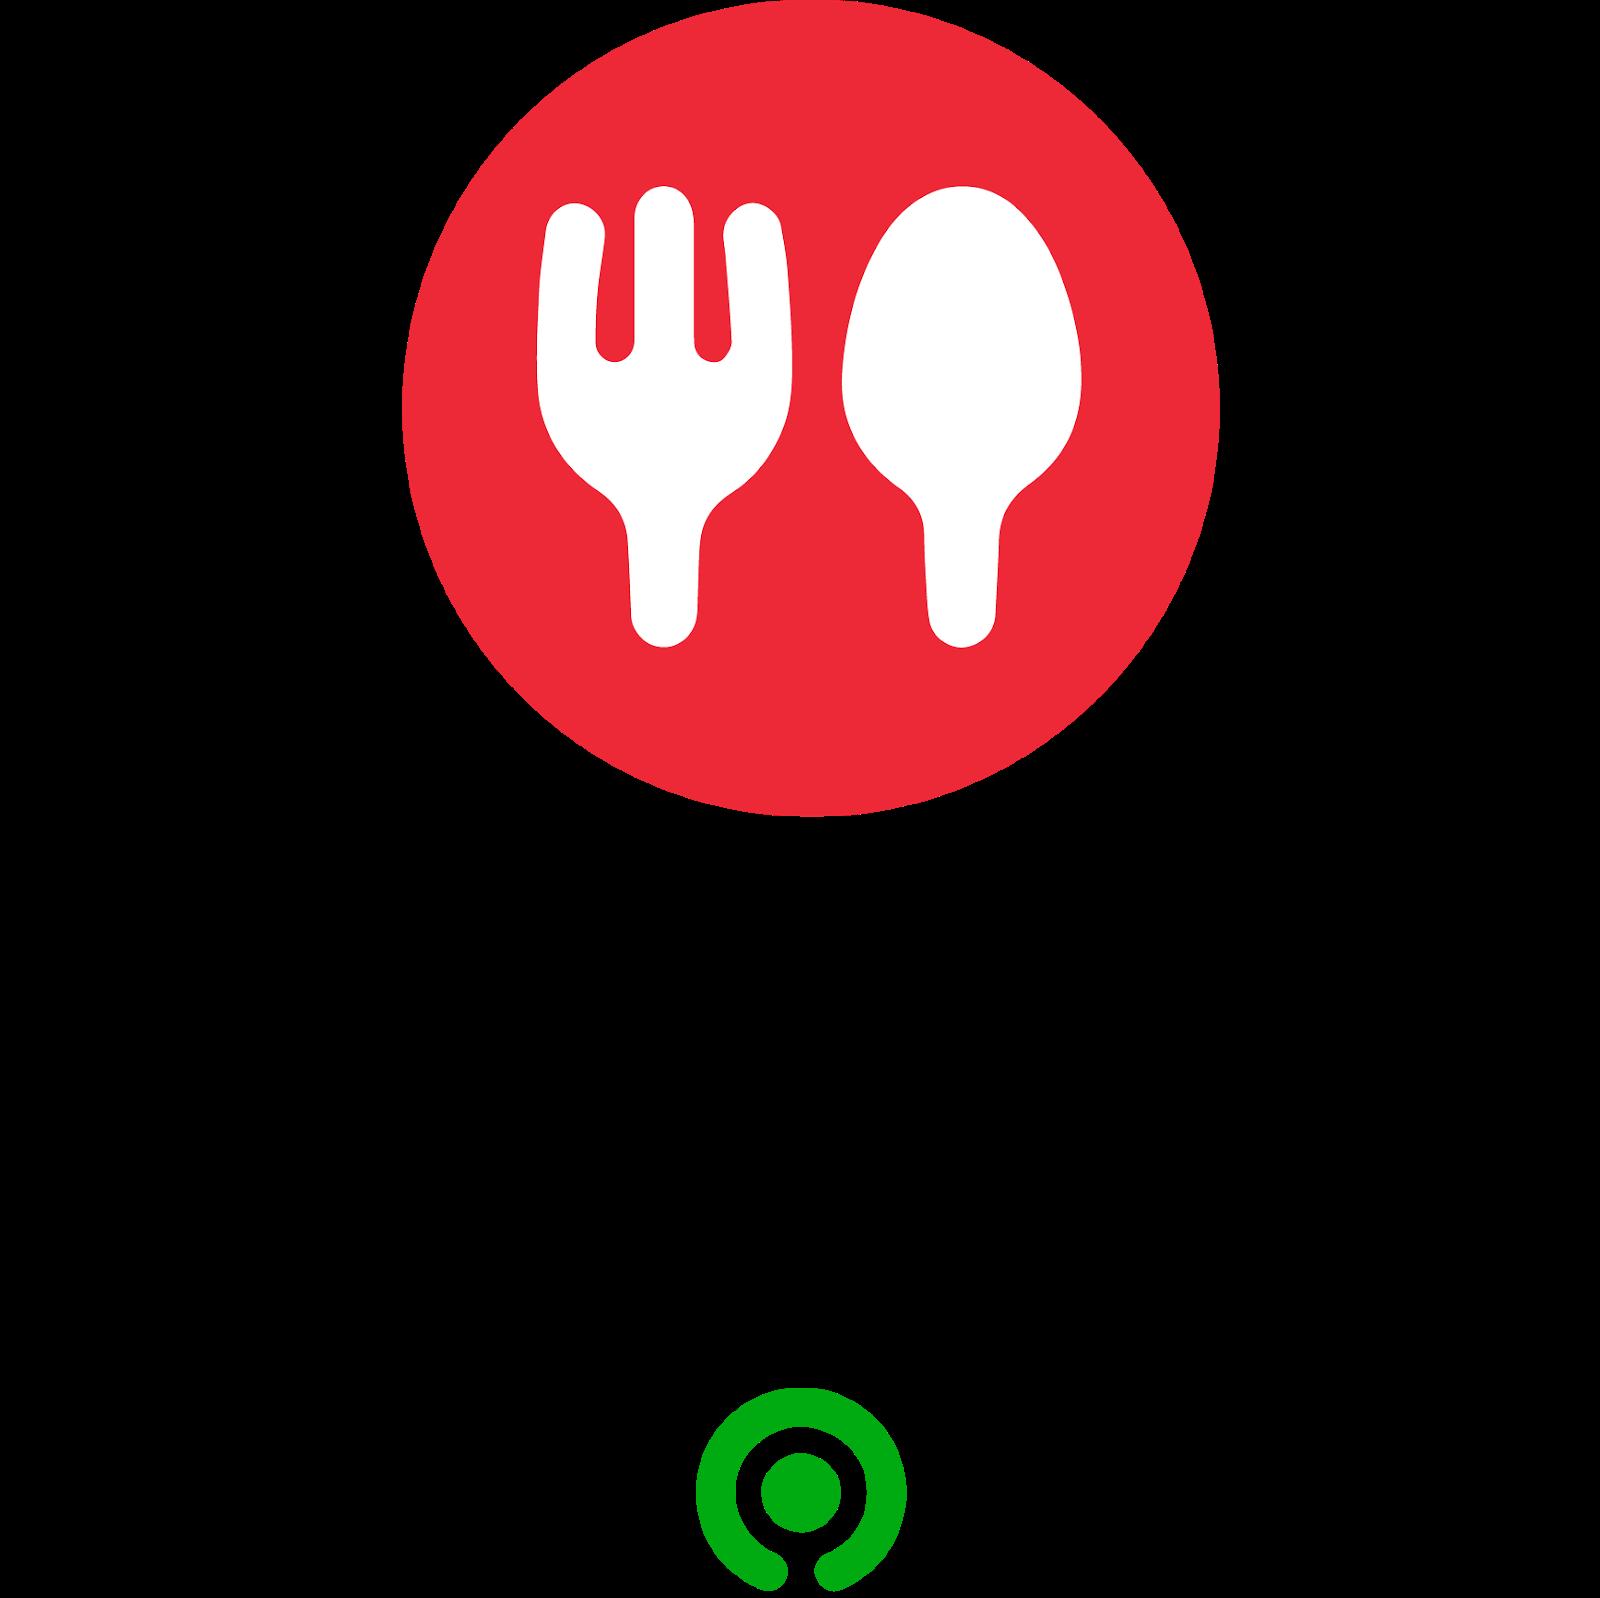 Gopay Gojek: Logo Gojek NEW 2019 Free Vector (Bonus Logo Gopay + Gofood